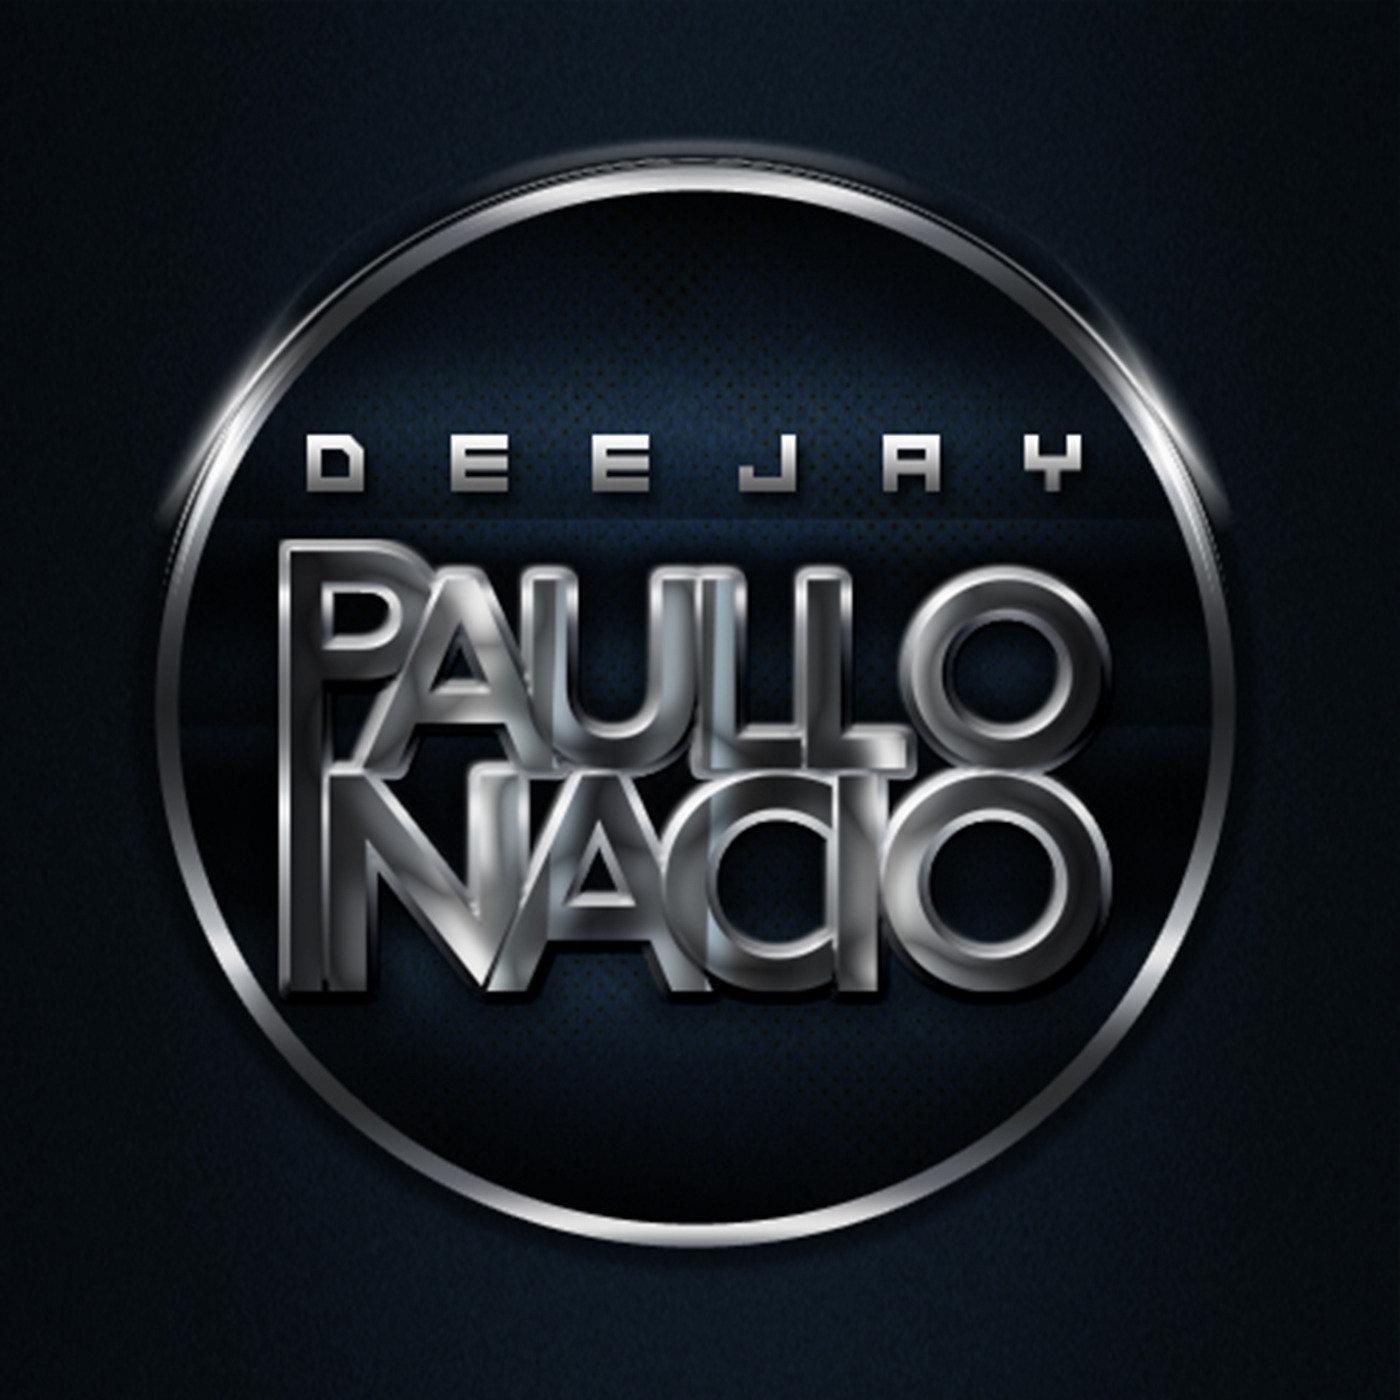 <![CDATA[DJ Paulo Inácio]]>